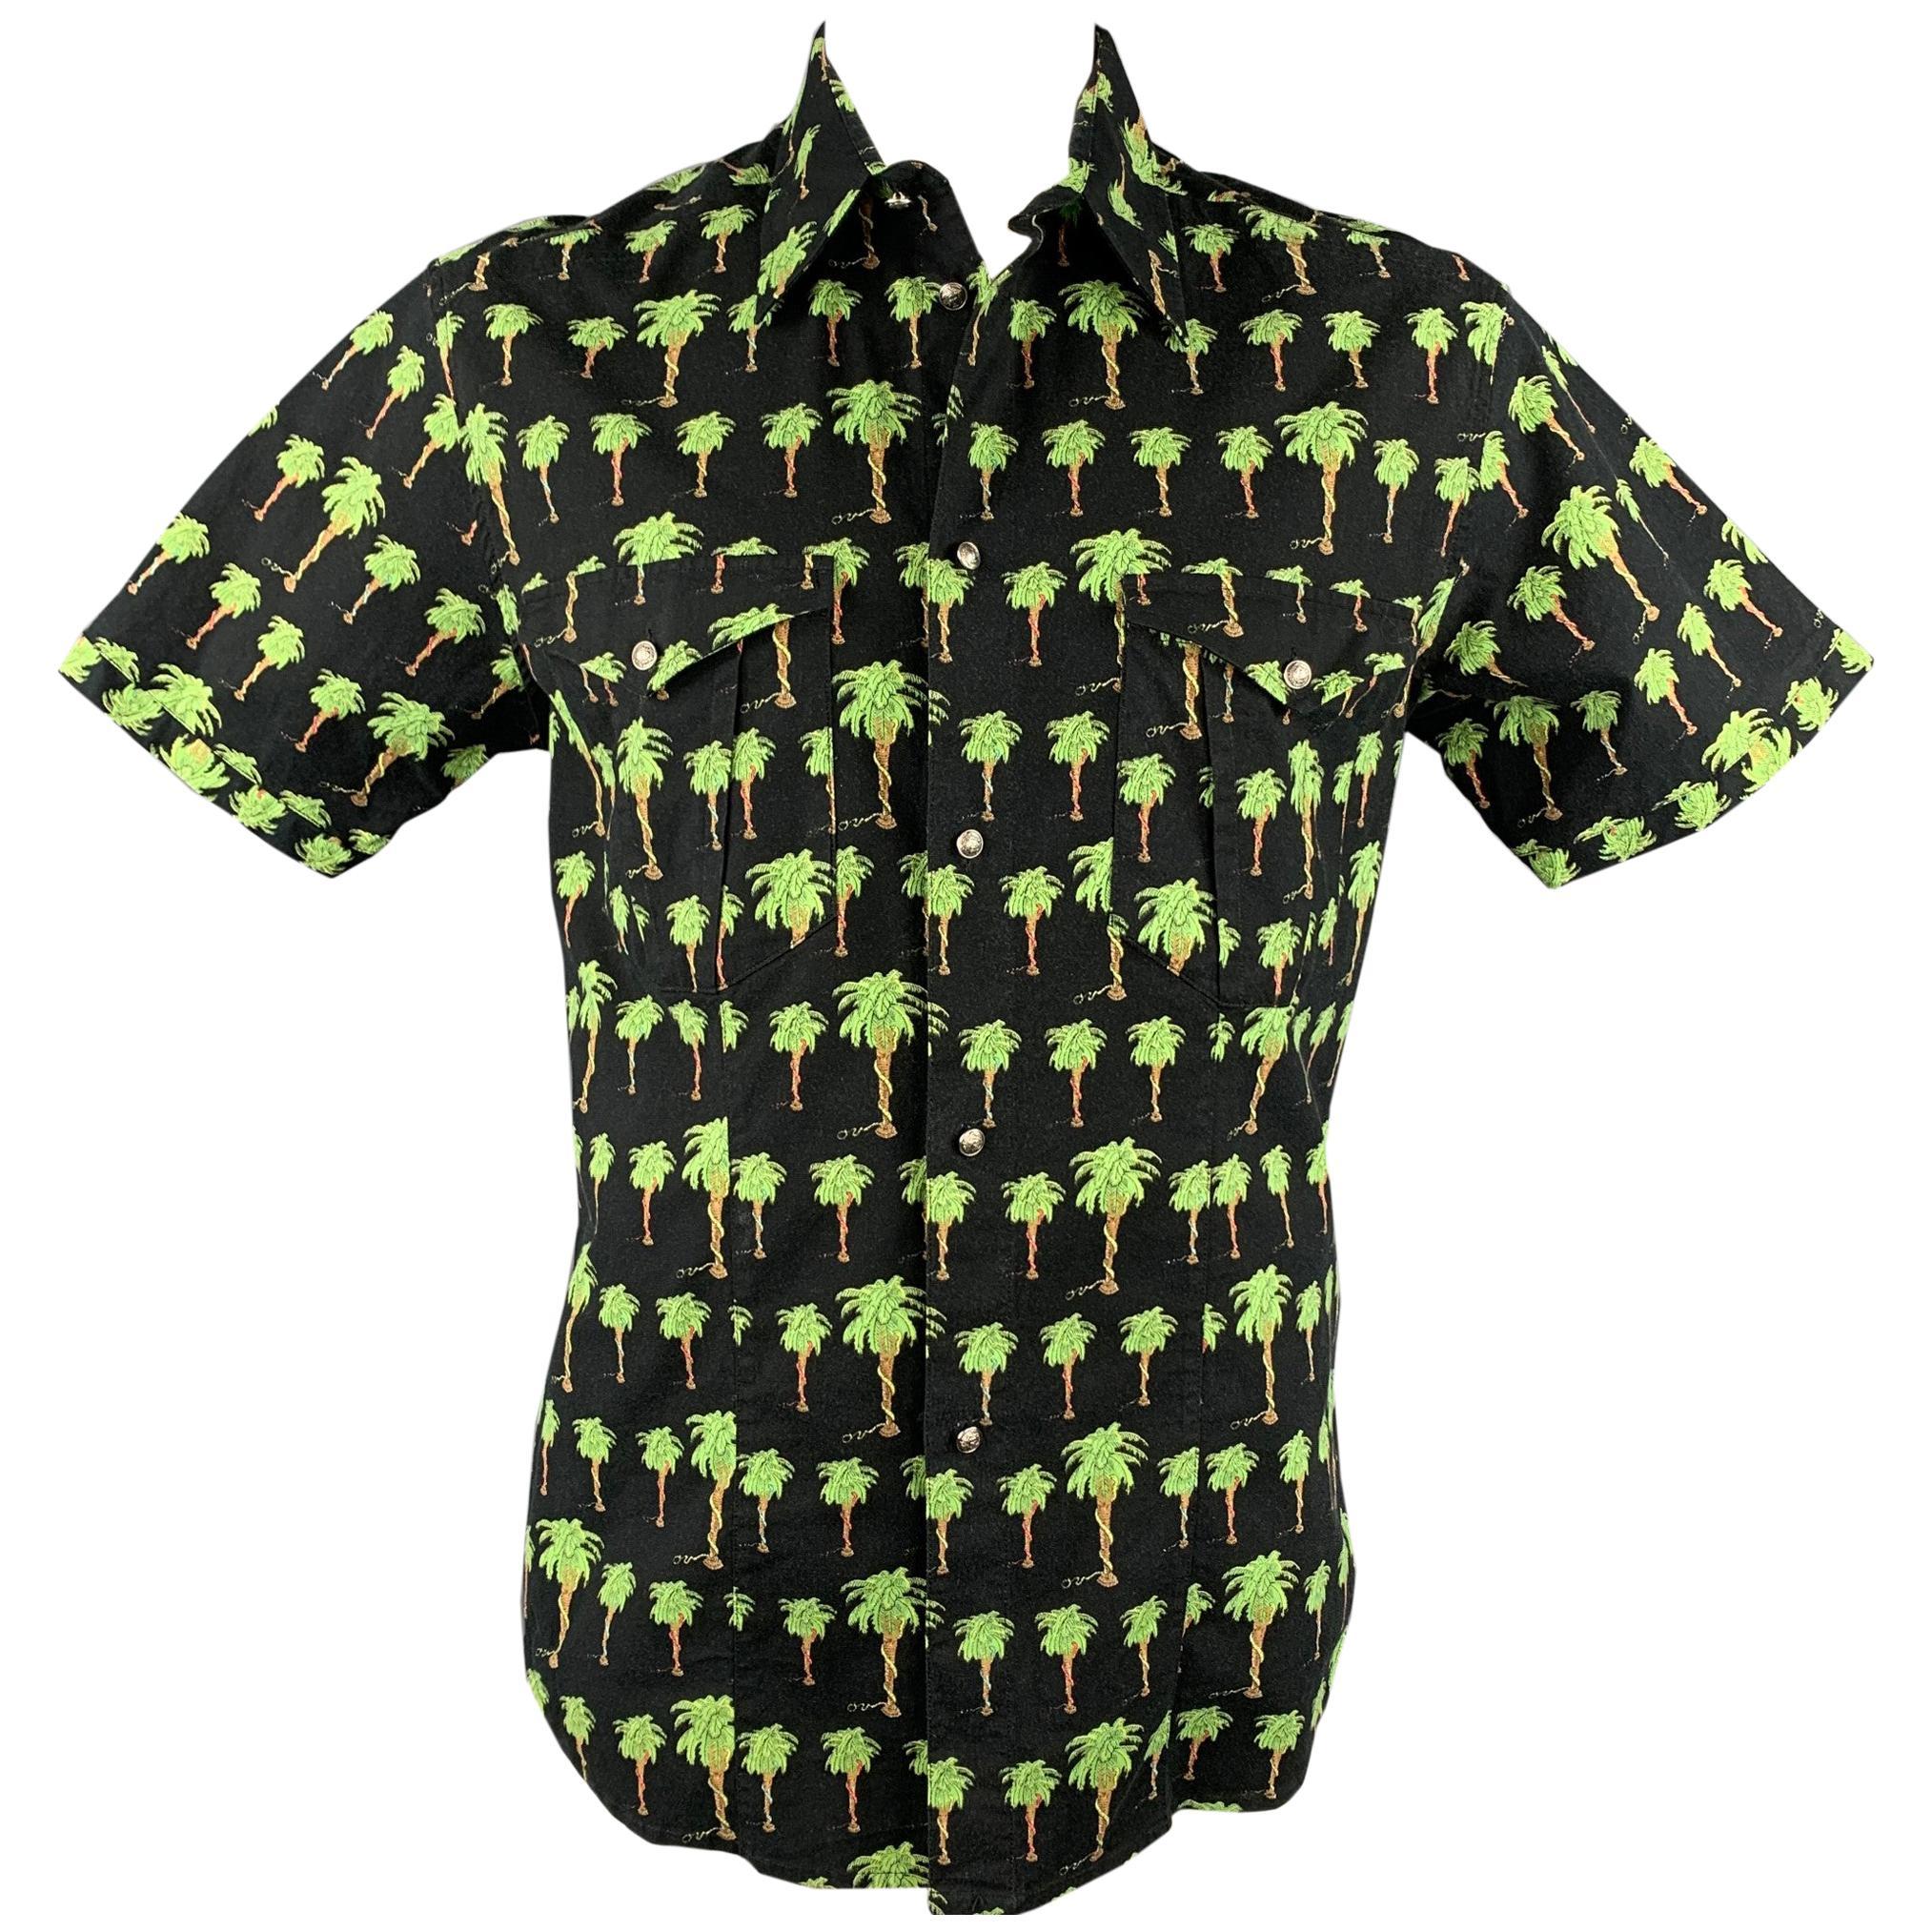 VERSACE JEANS COUTURE Size XXL Black & Green Palm Tree Print Cotton Shirt